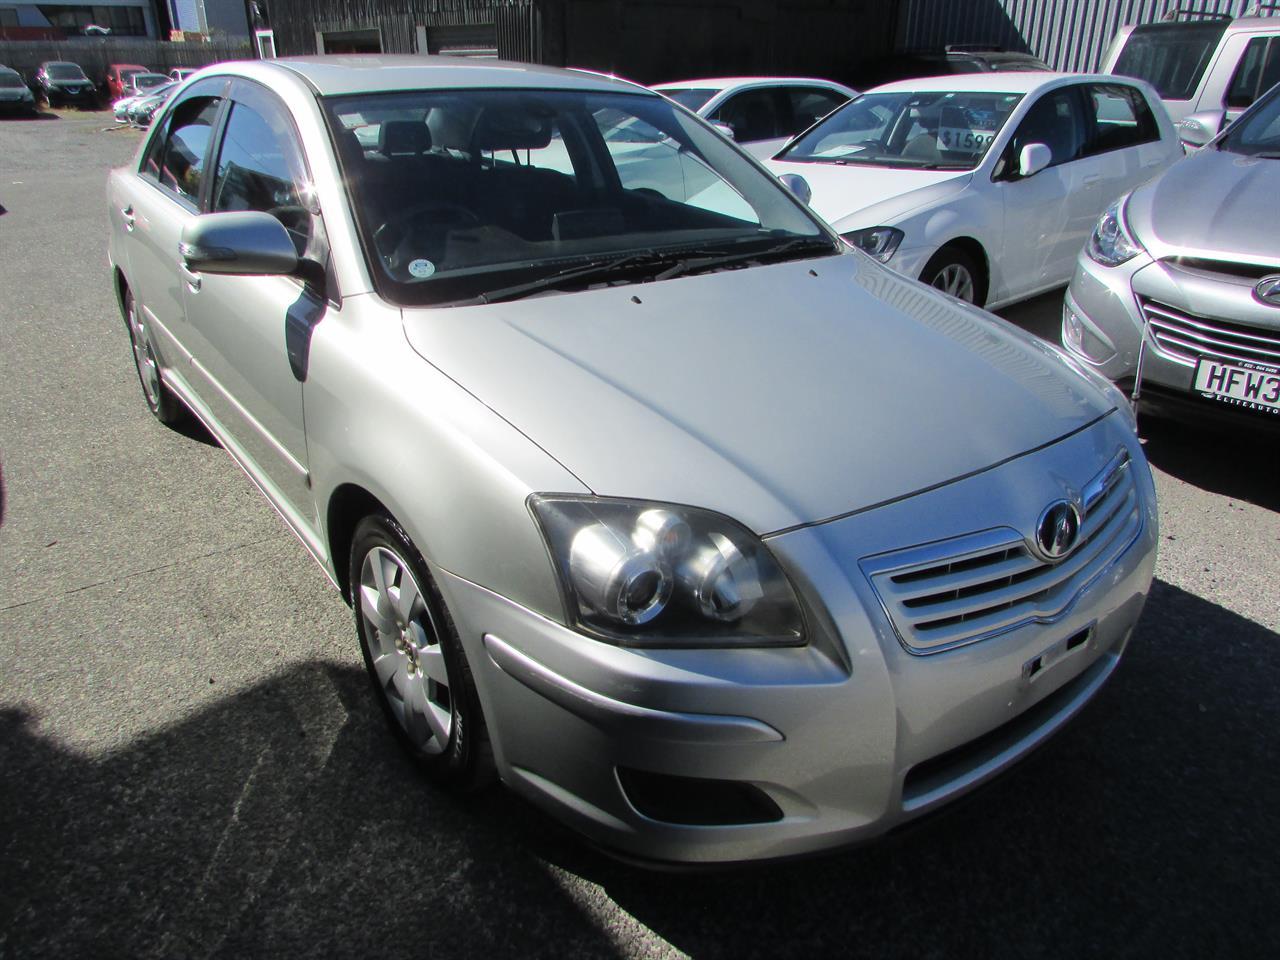 Motors Cars & parts Cars : 2006 Toyota Avensis 2.0 Camchain Black trim Low km